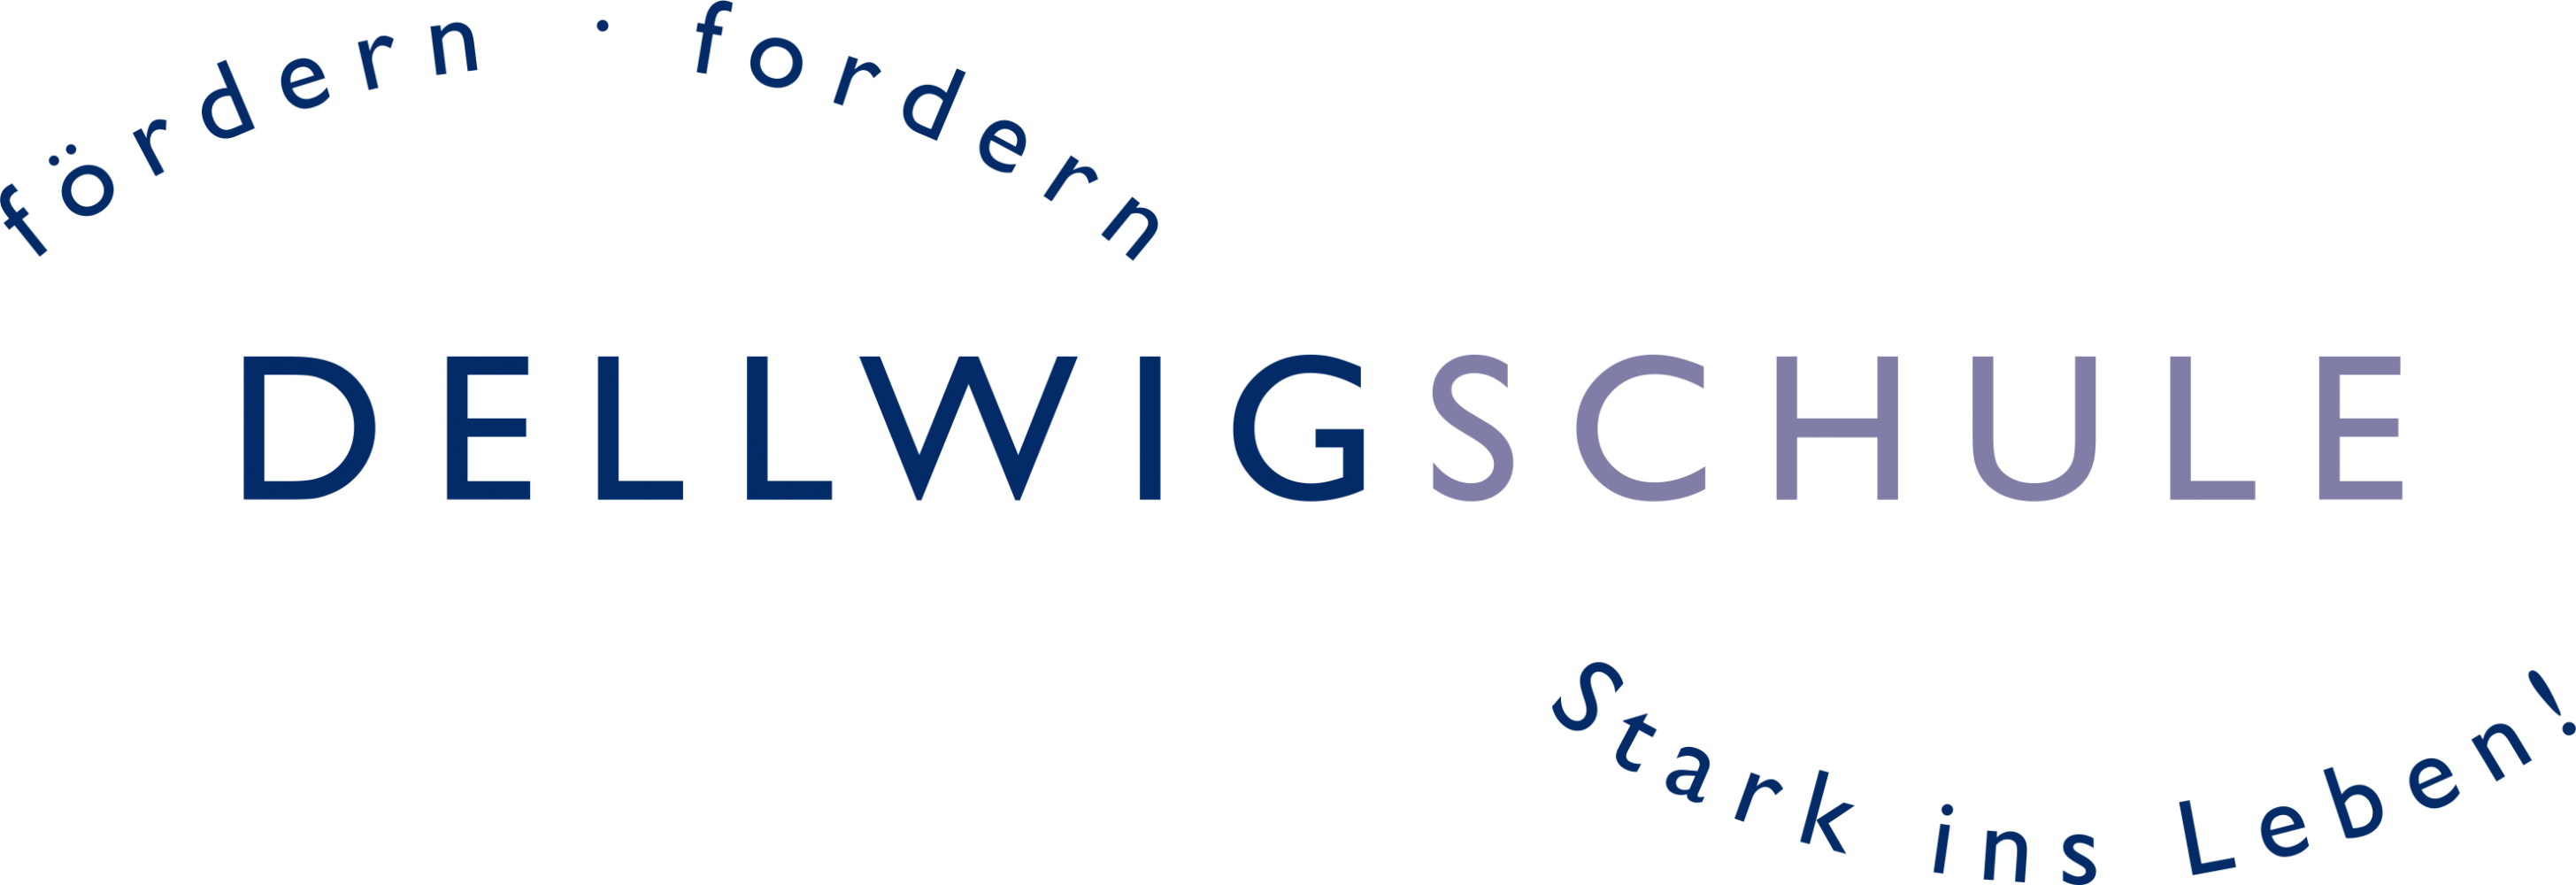 dellwigschule logo